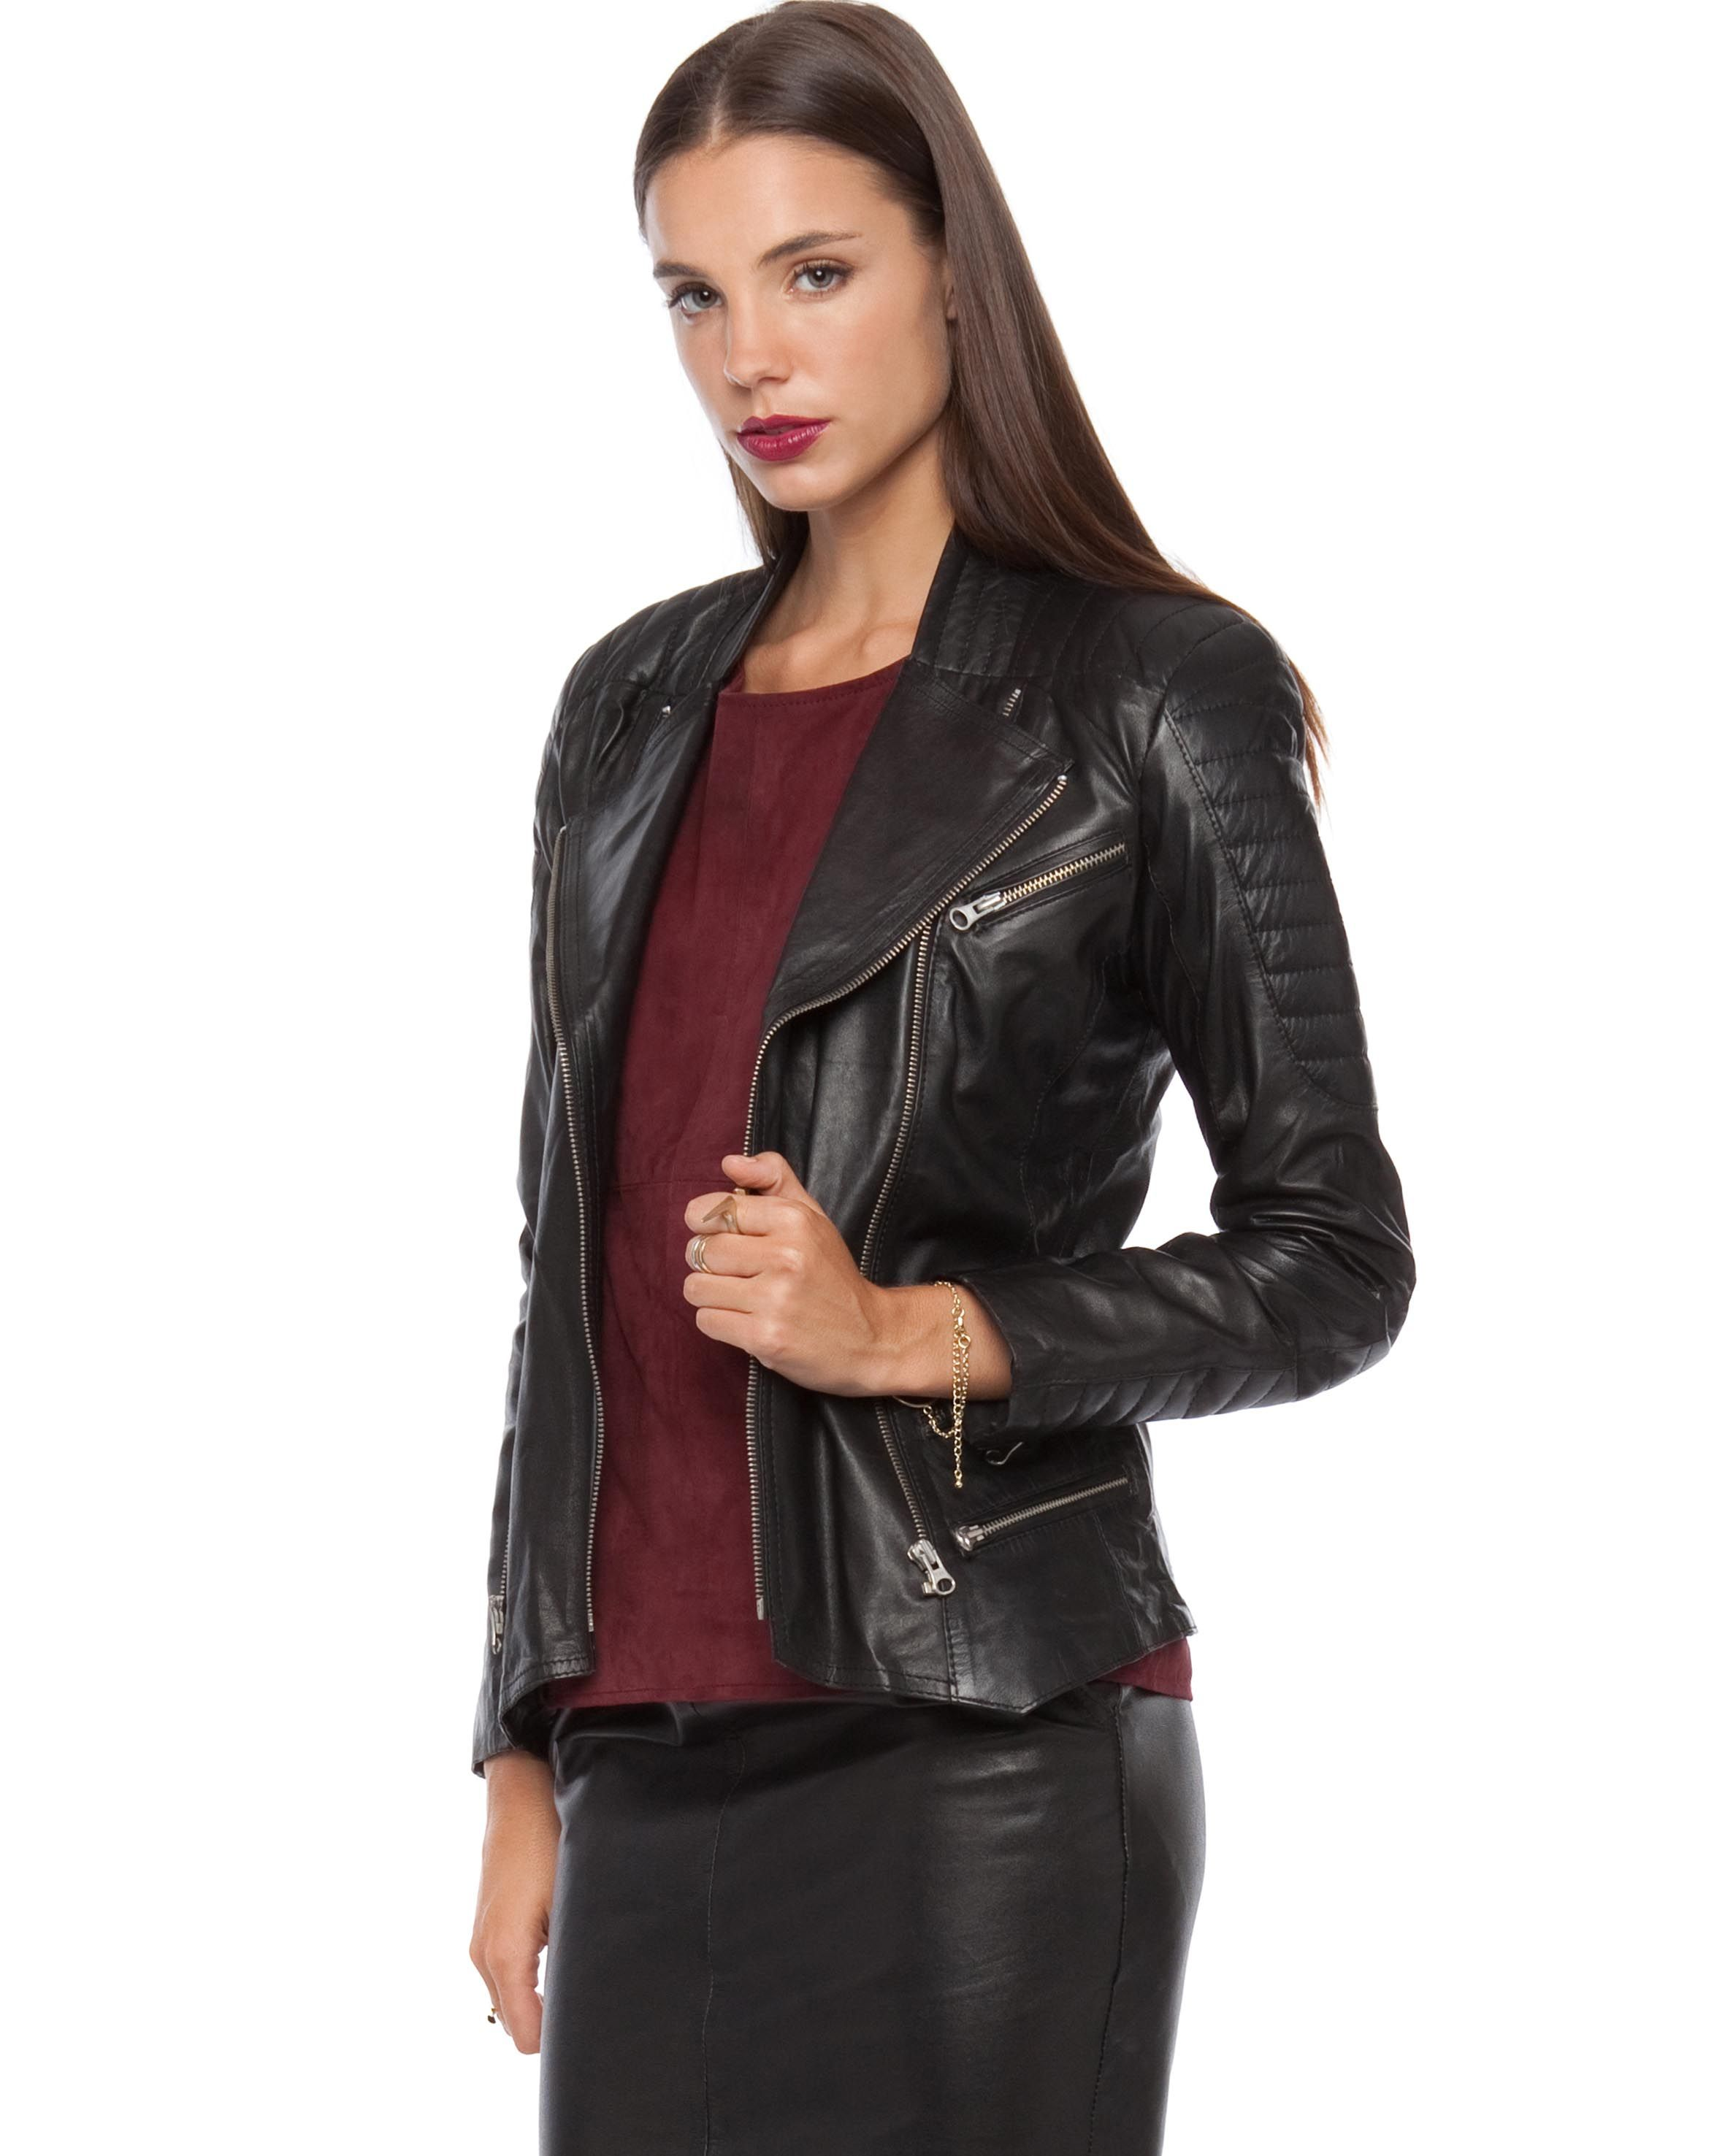 Leather jacket online australia - Leather Biker Jacket With Shoulder Detail By Jennifer Kate Online The Iconic Australia